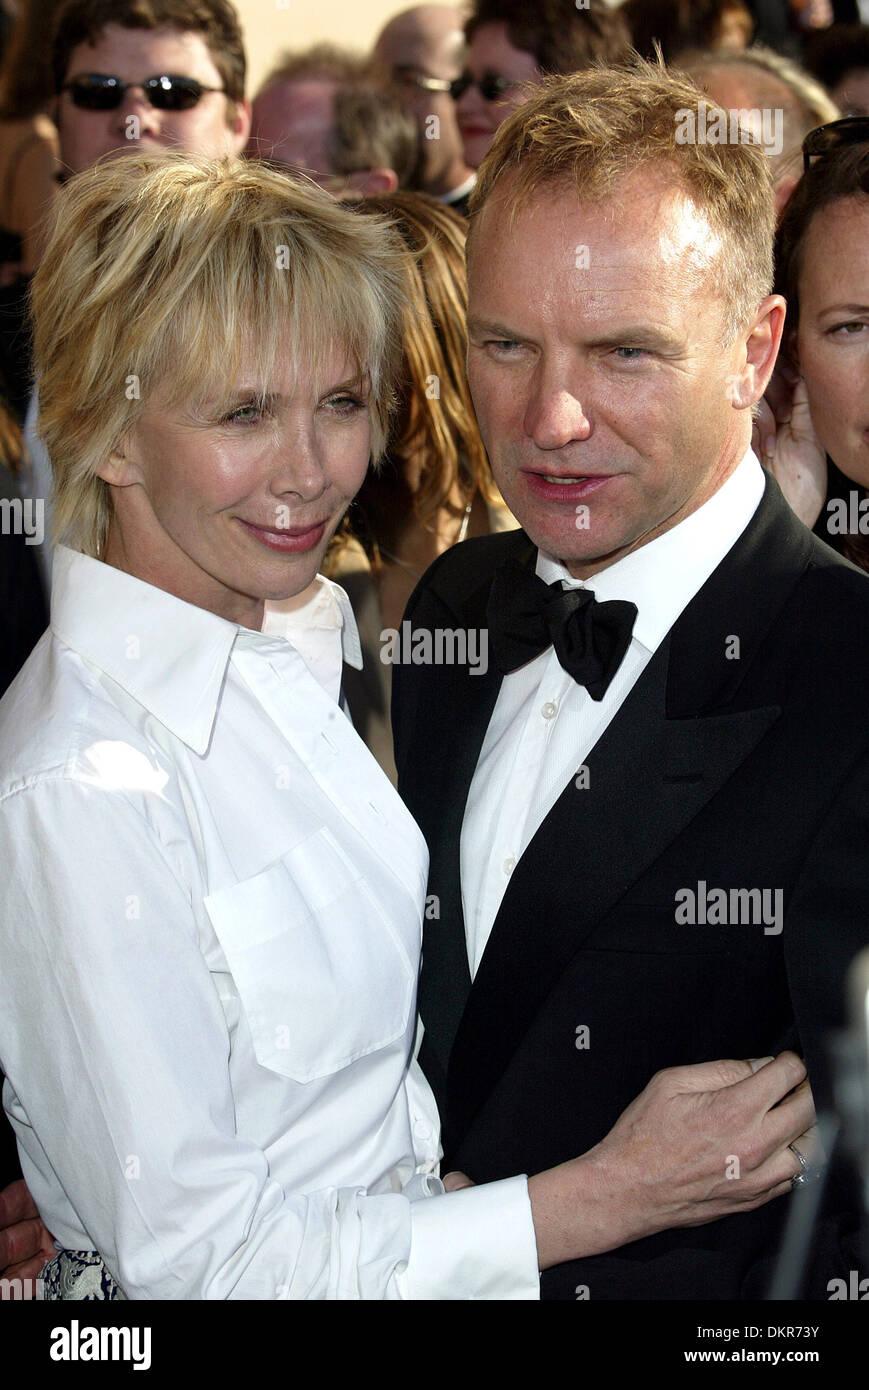 STING & TRUDIE STYLER.SINGER & WIFE.SA.SHRINE THEATRE, LOS ANGELES, U.10/03/2002.LA796 Stock Photo